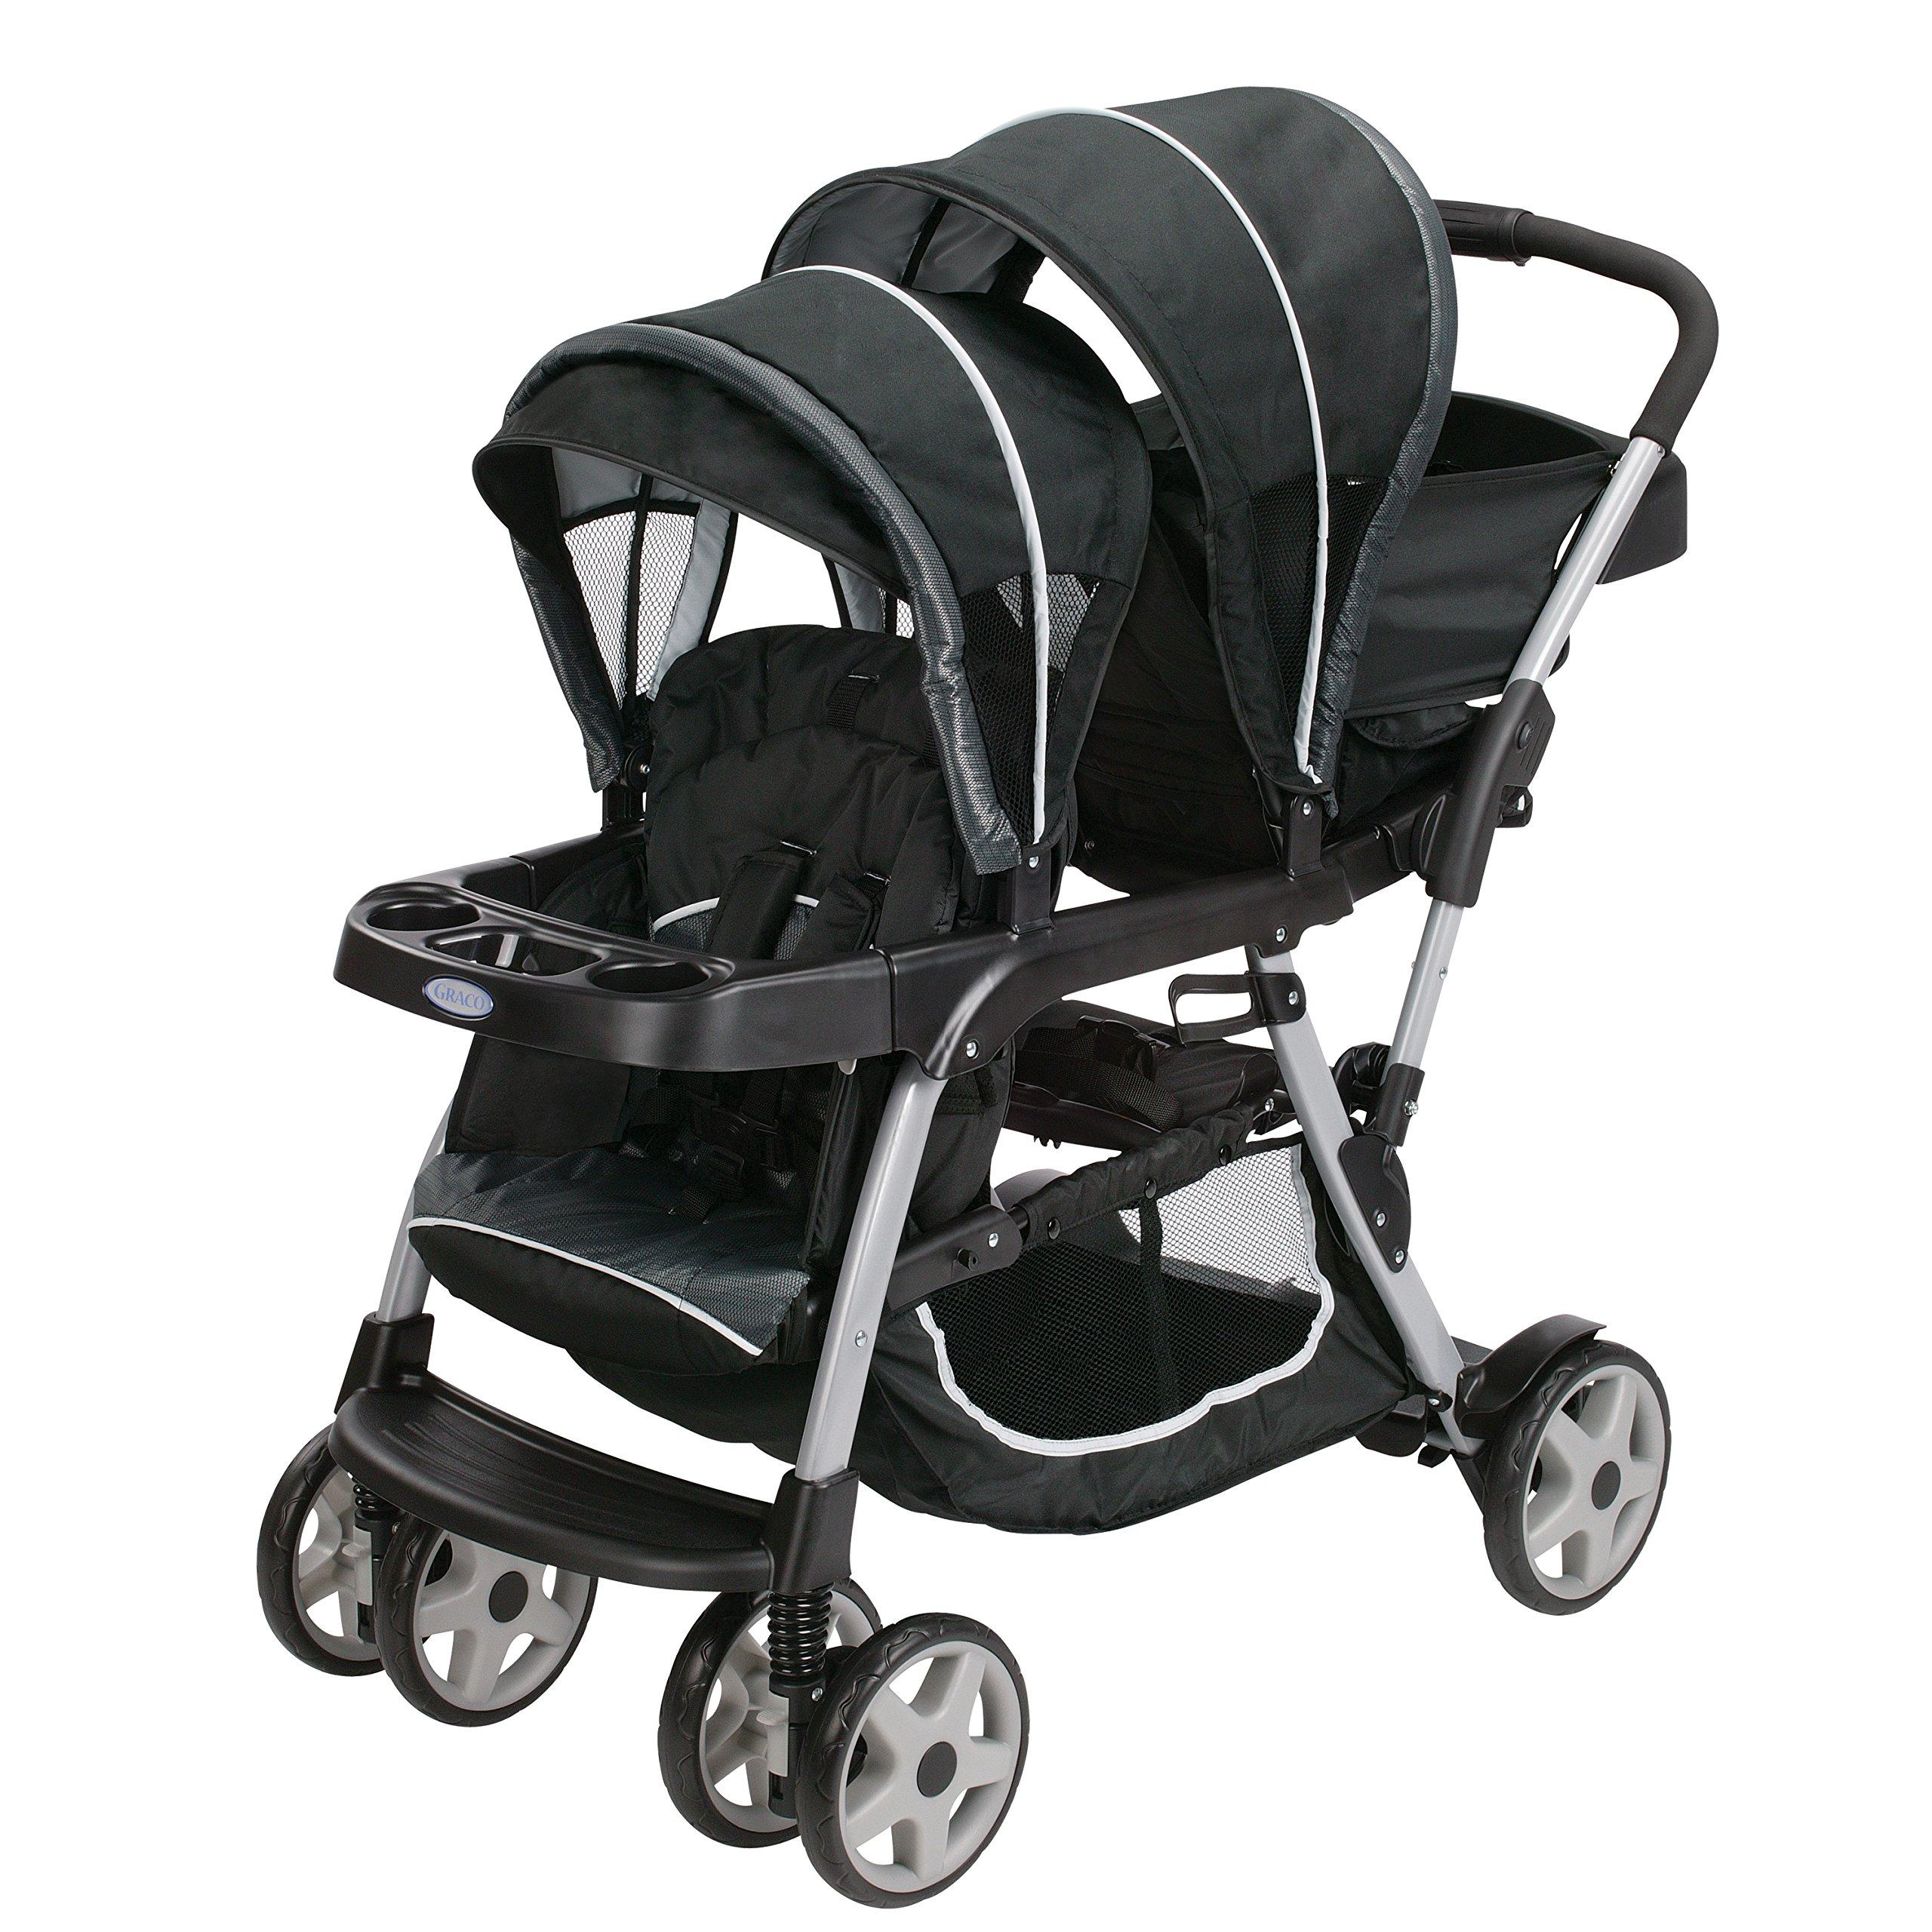 Graco Ready2Grow Double Stroller Gotham